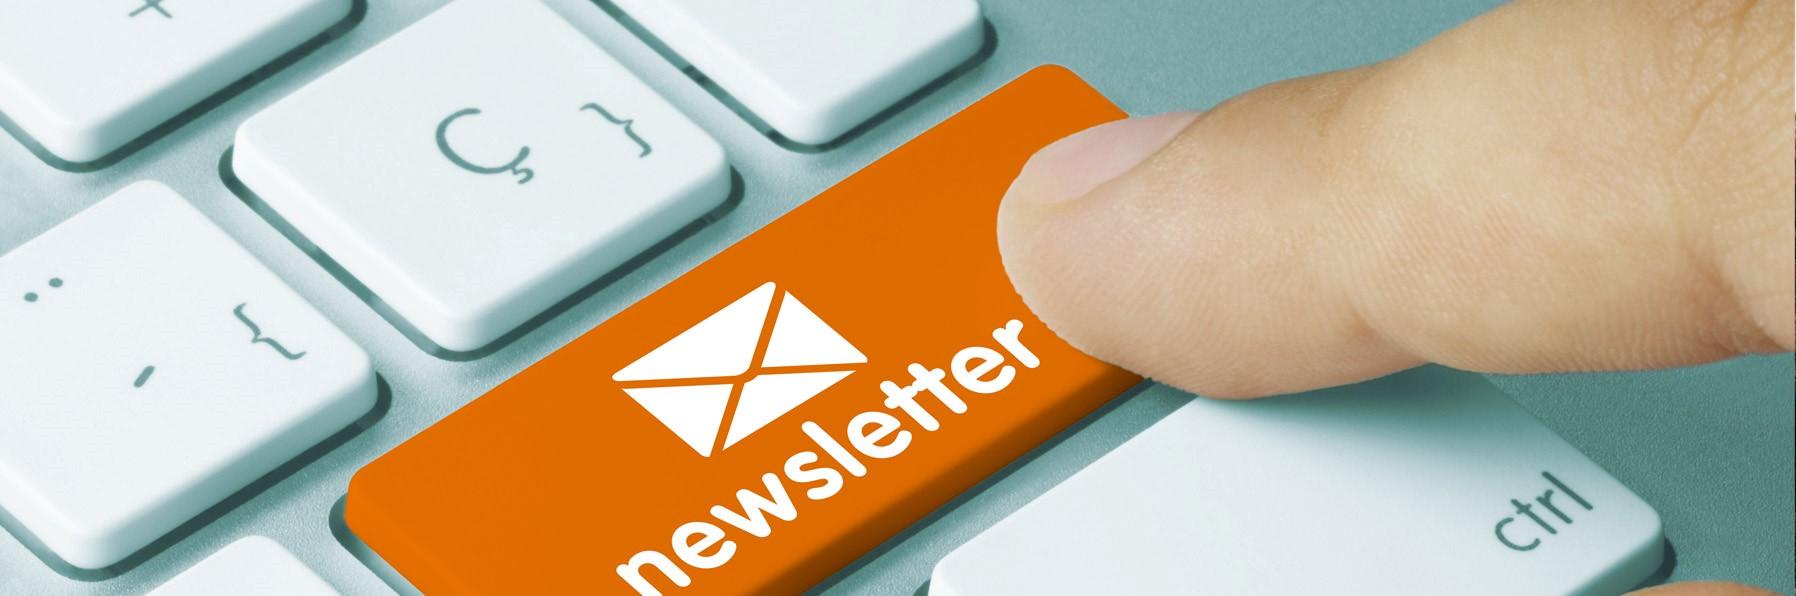 Newsletter Photograph